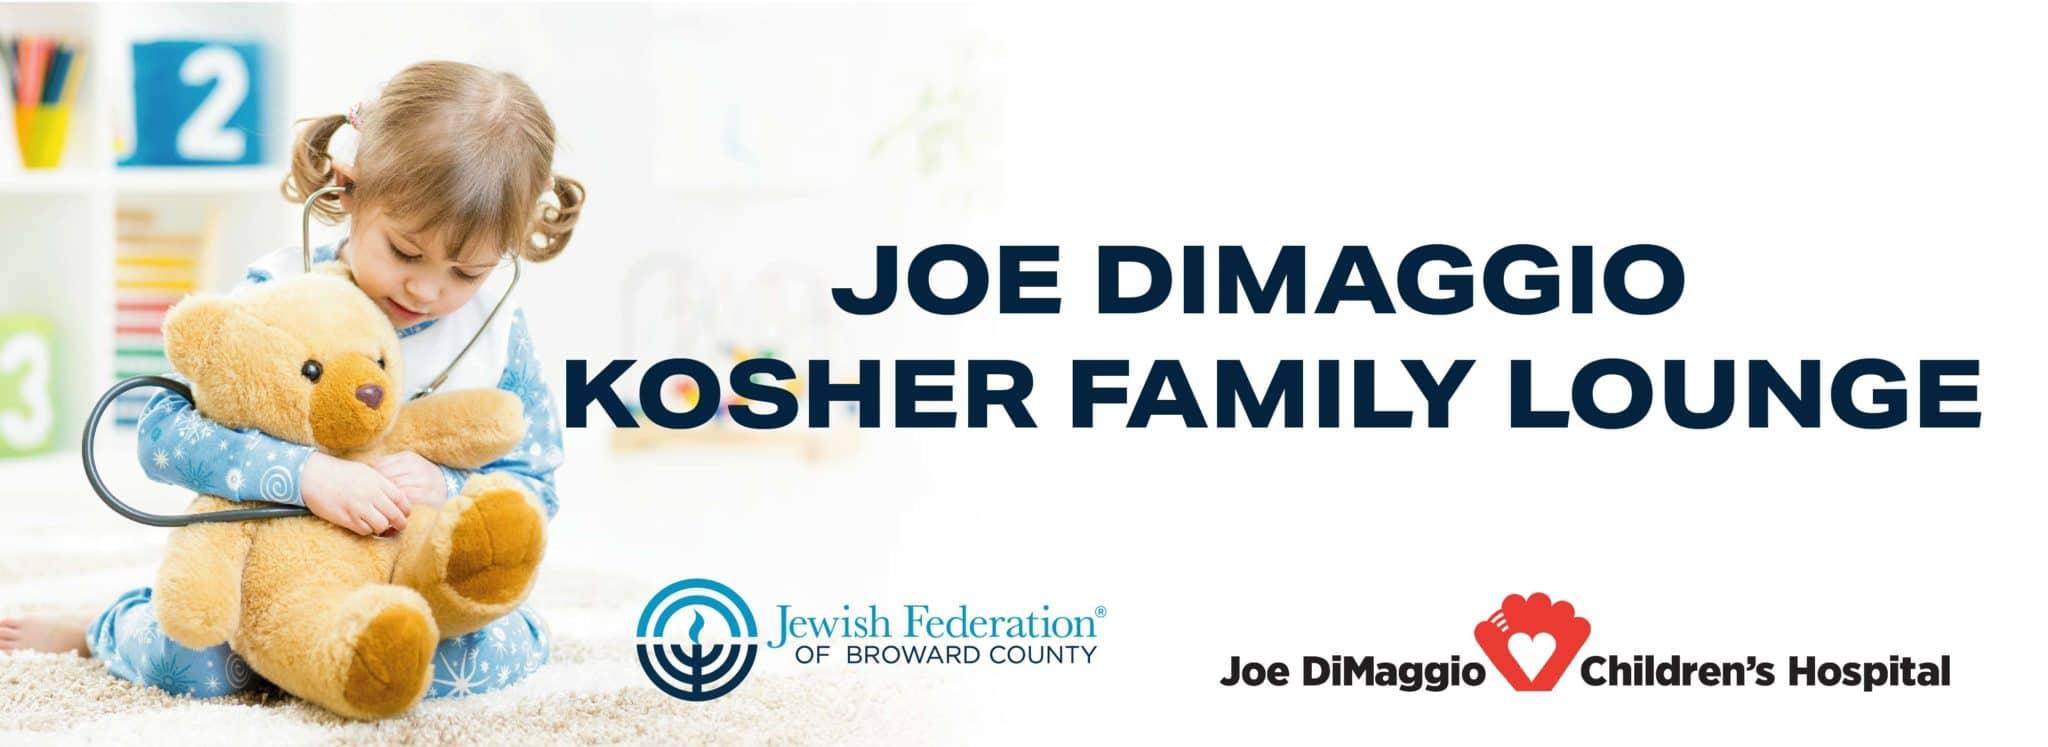 Joe DiMaggio Fund Branding 01